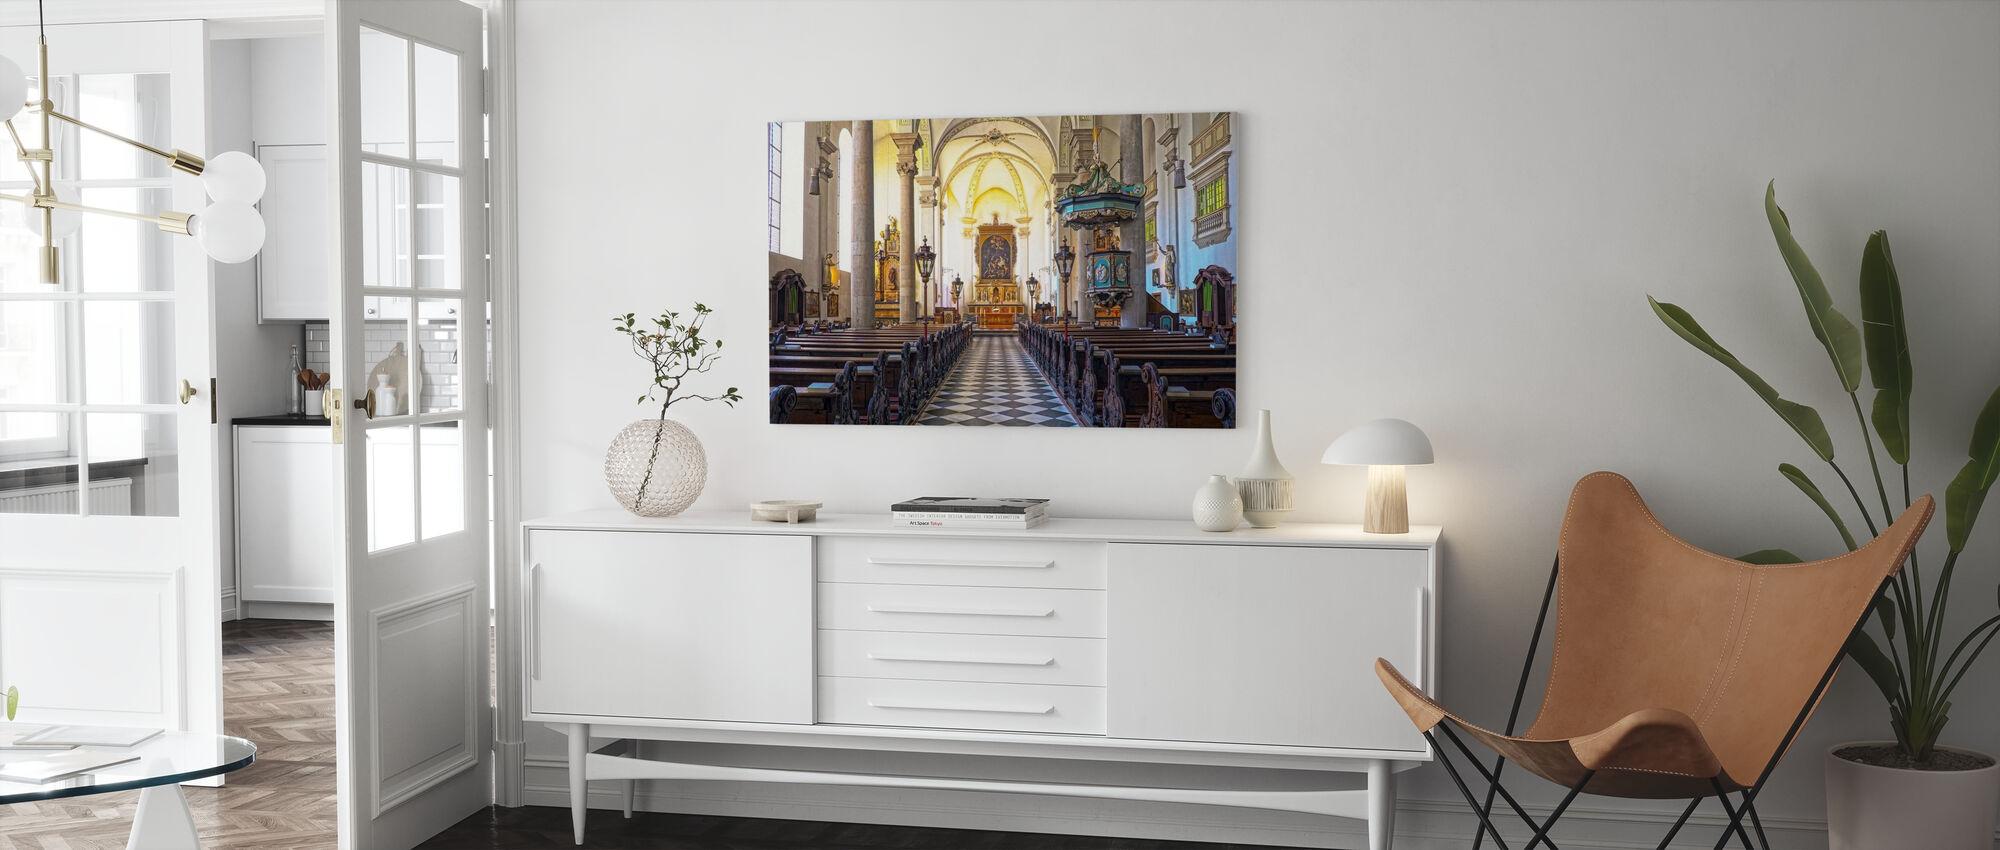 Kirke Bøyer - Lerretsbilde - Stue